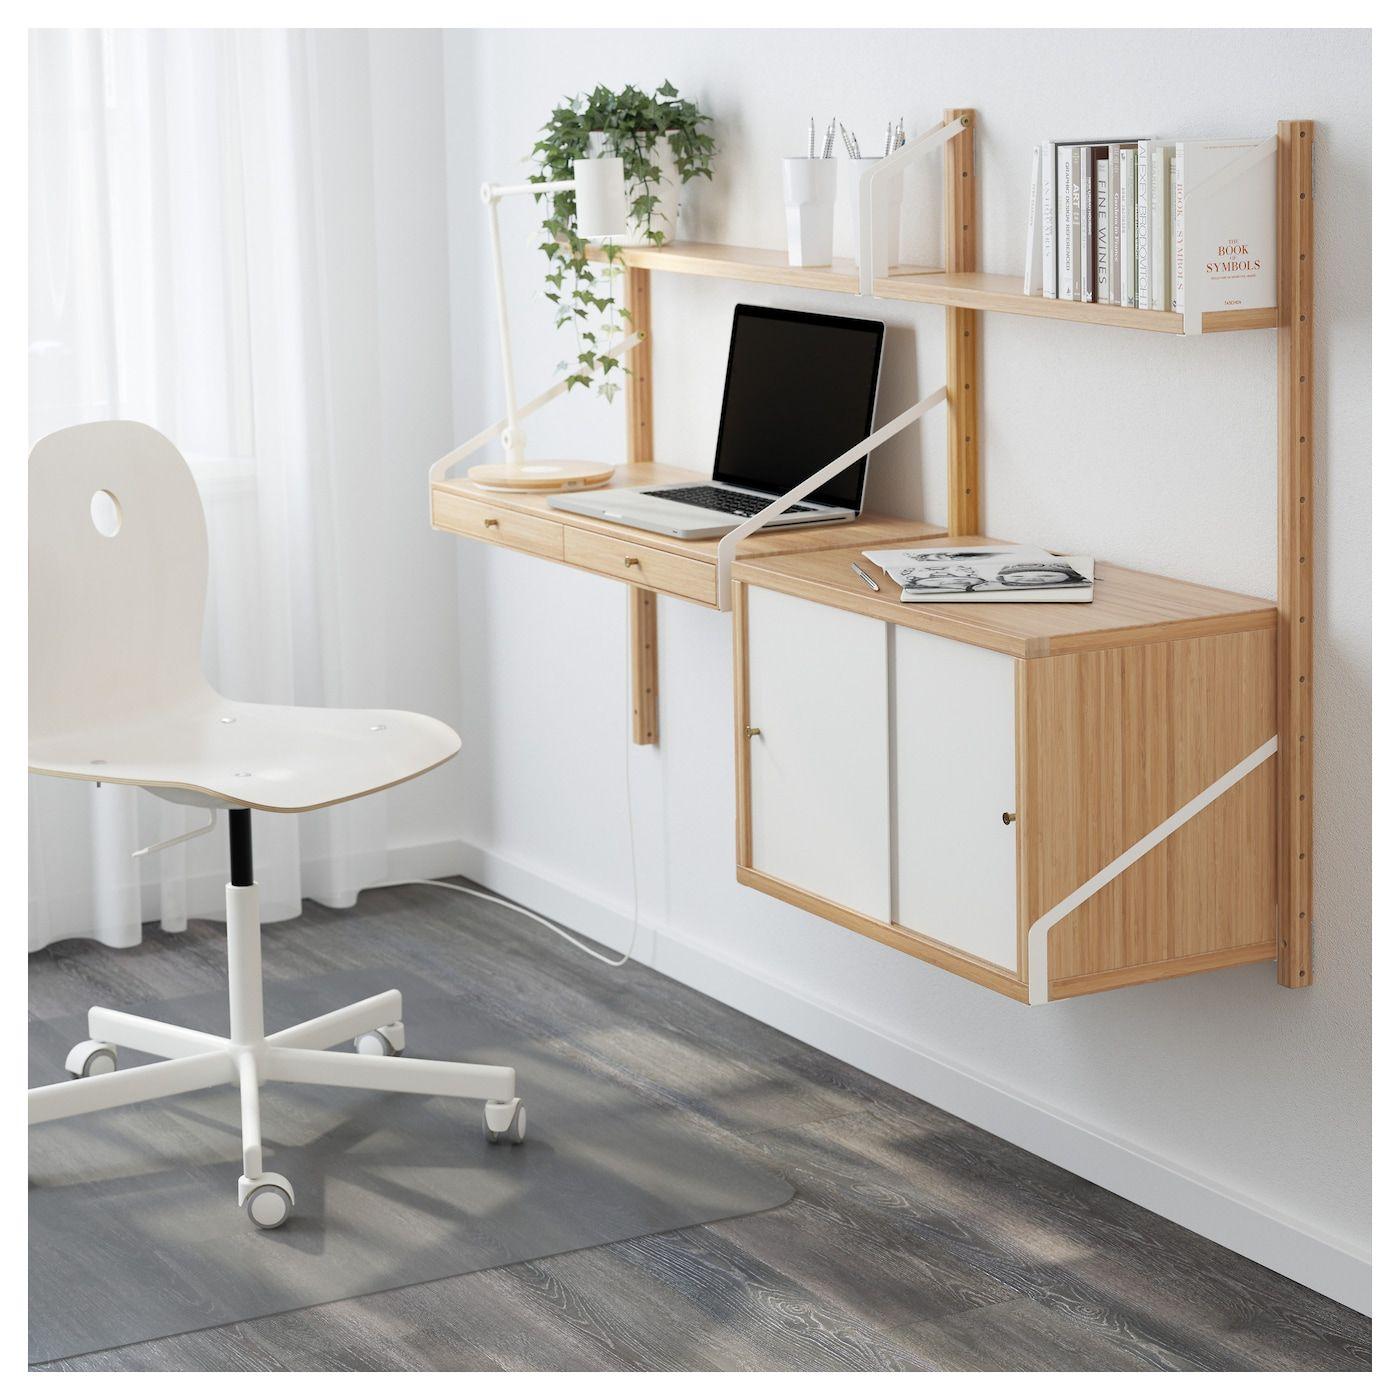 Us Furniture And Home Furnishings Bureau Mural Bureau Mural Ikea Rangement Mural